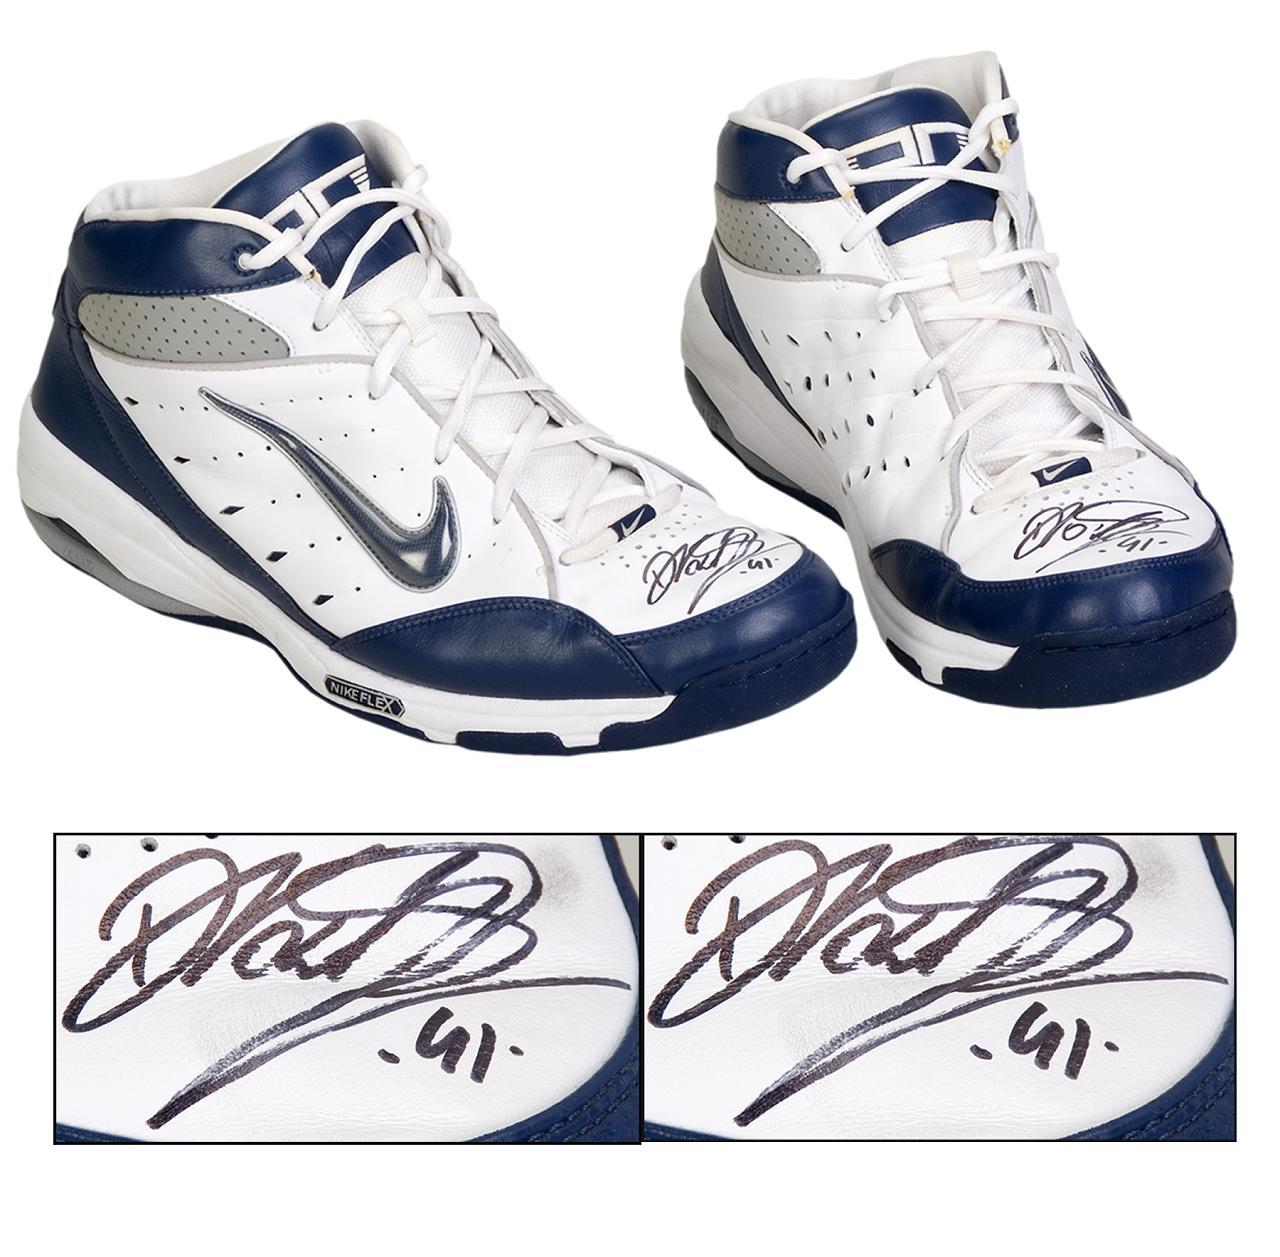 Nba Store Ph Shoes